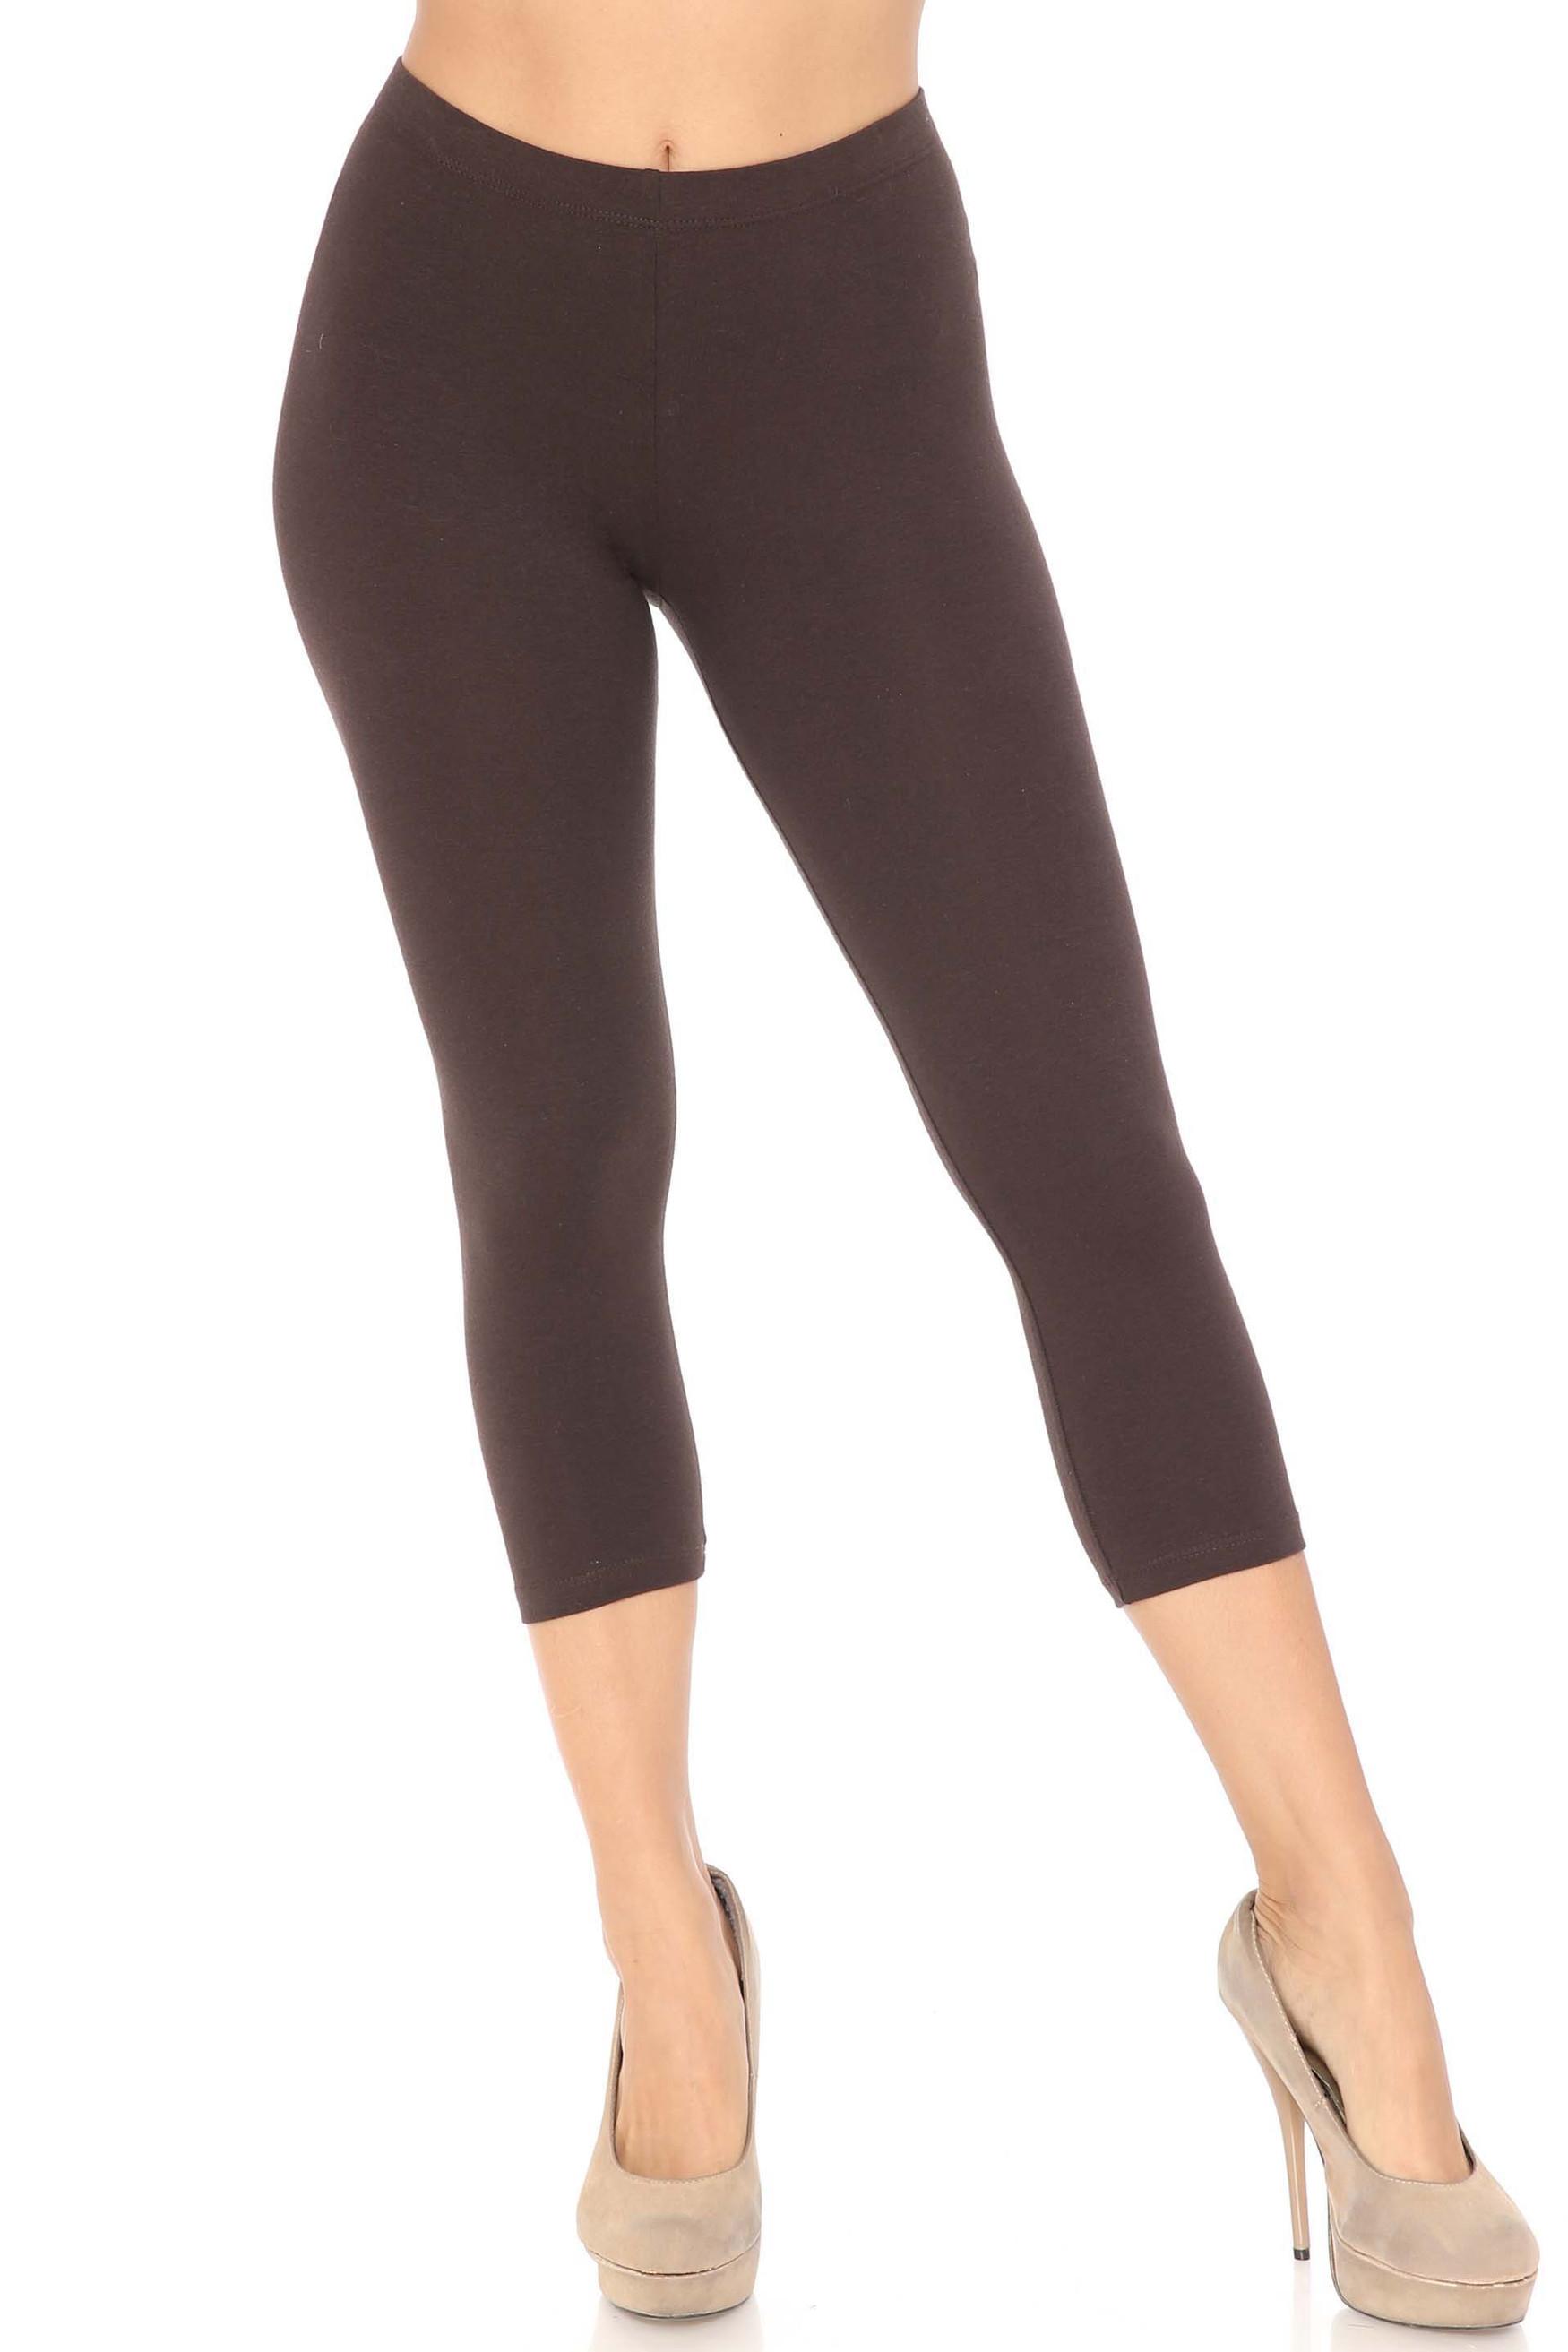 Front view of brown USA Cotton Capri Length Leggings